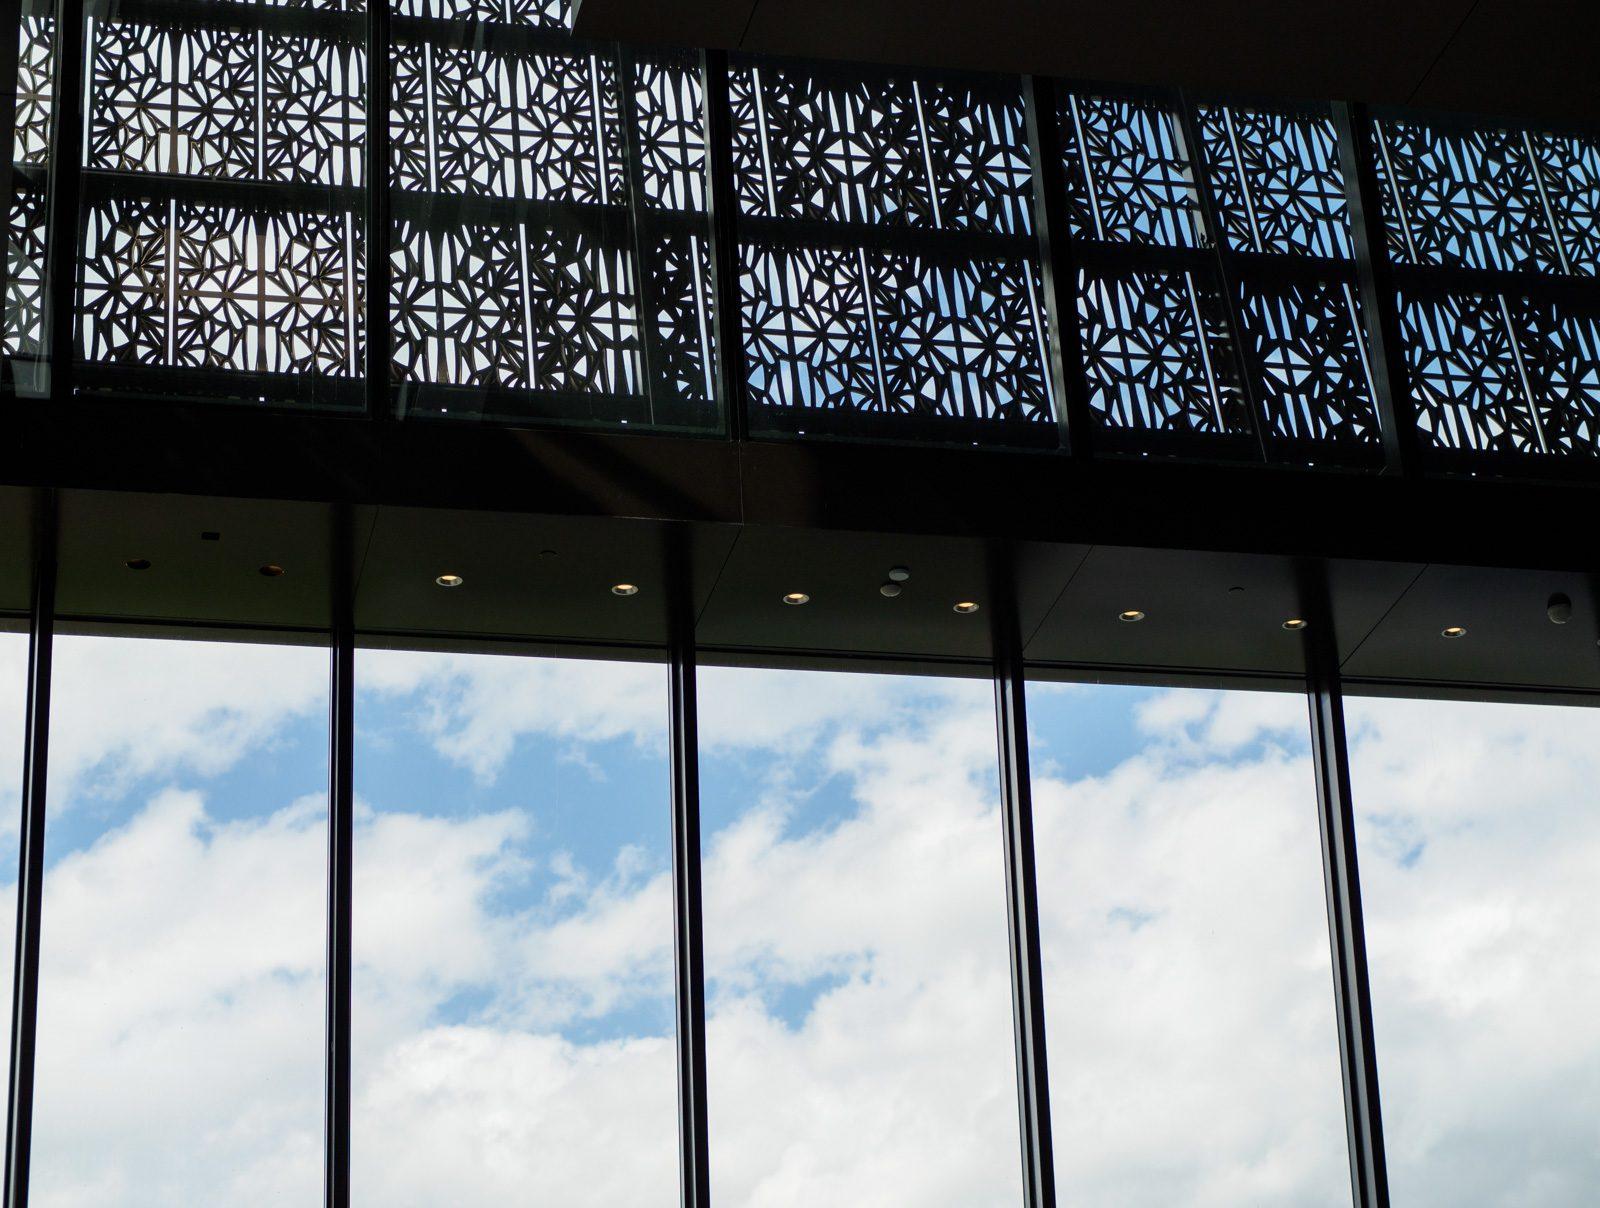 Lattice and Windows